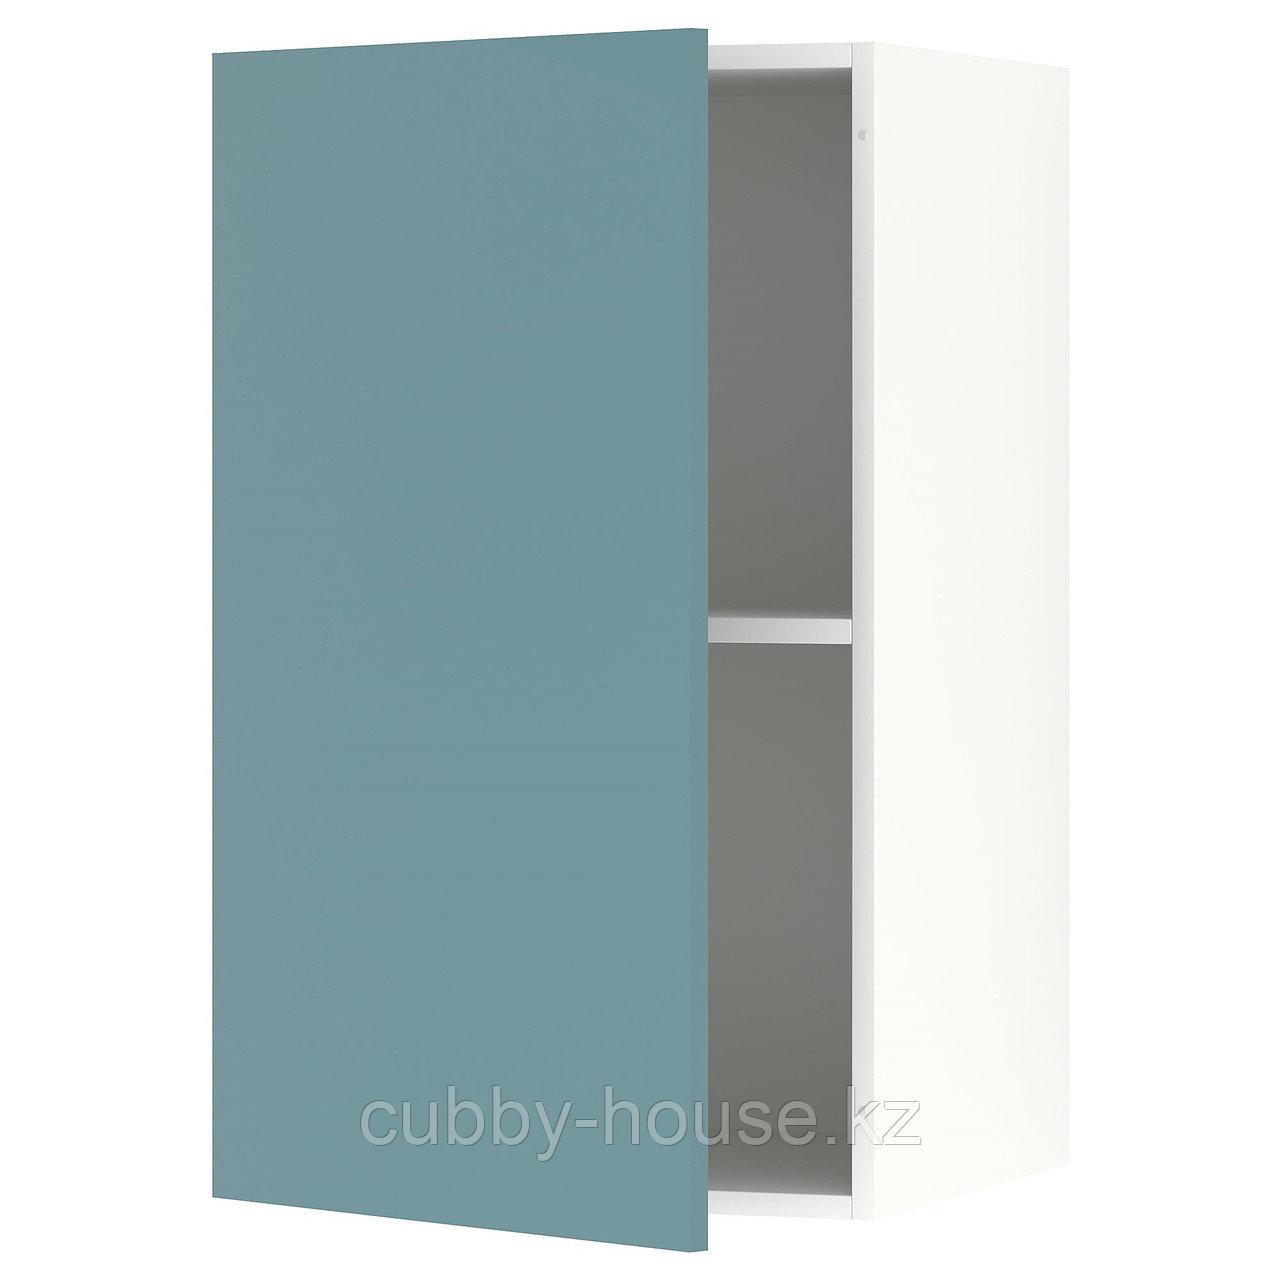 KNOXHULT КНОКСХУЛЬТ Навесной шкаф с дверцей, глянцевый/синяя бирюза40x75 см